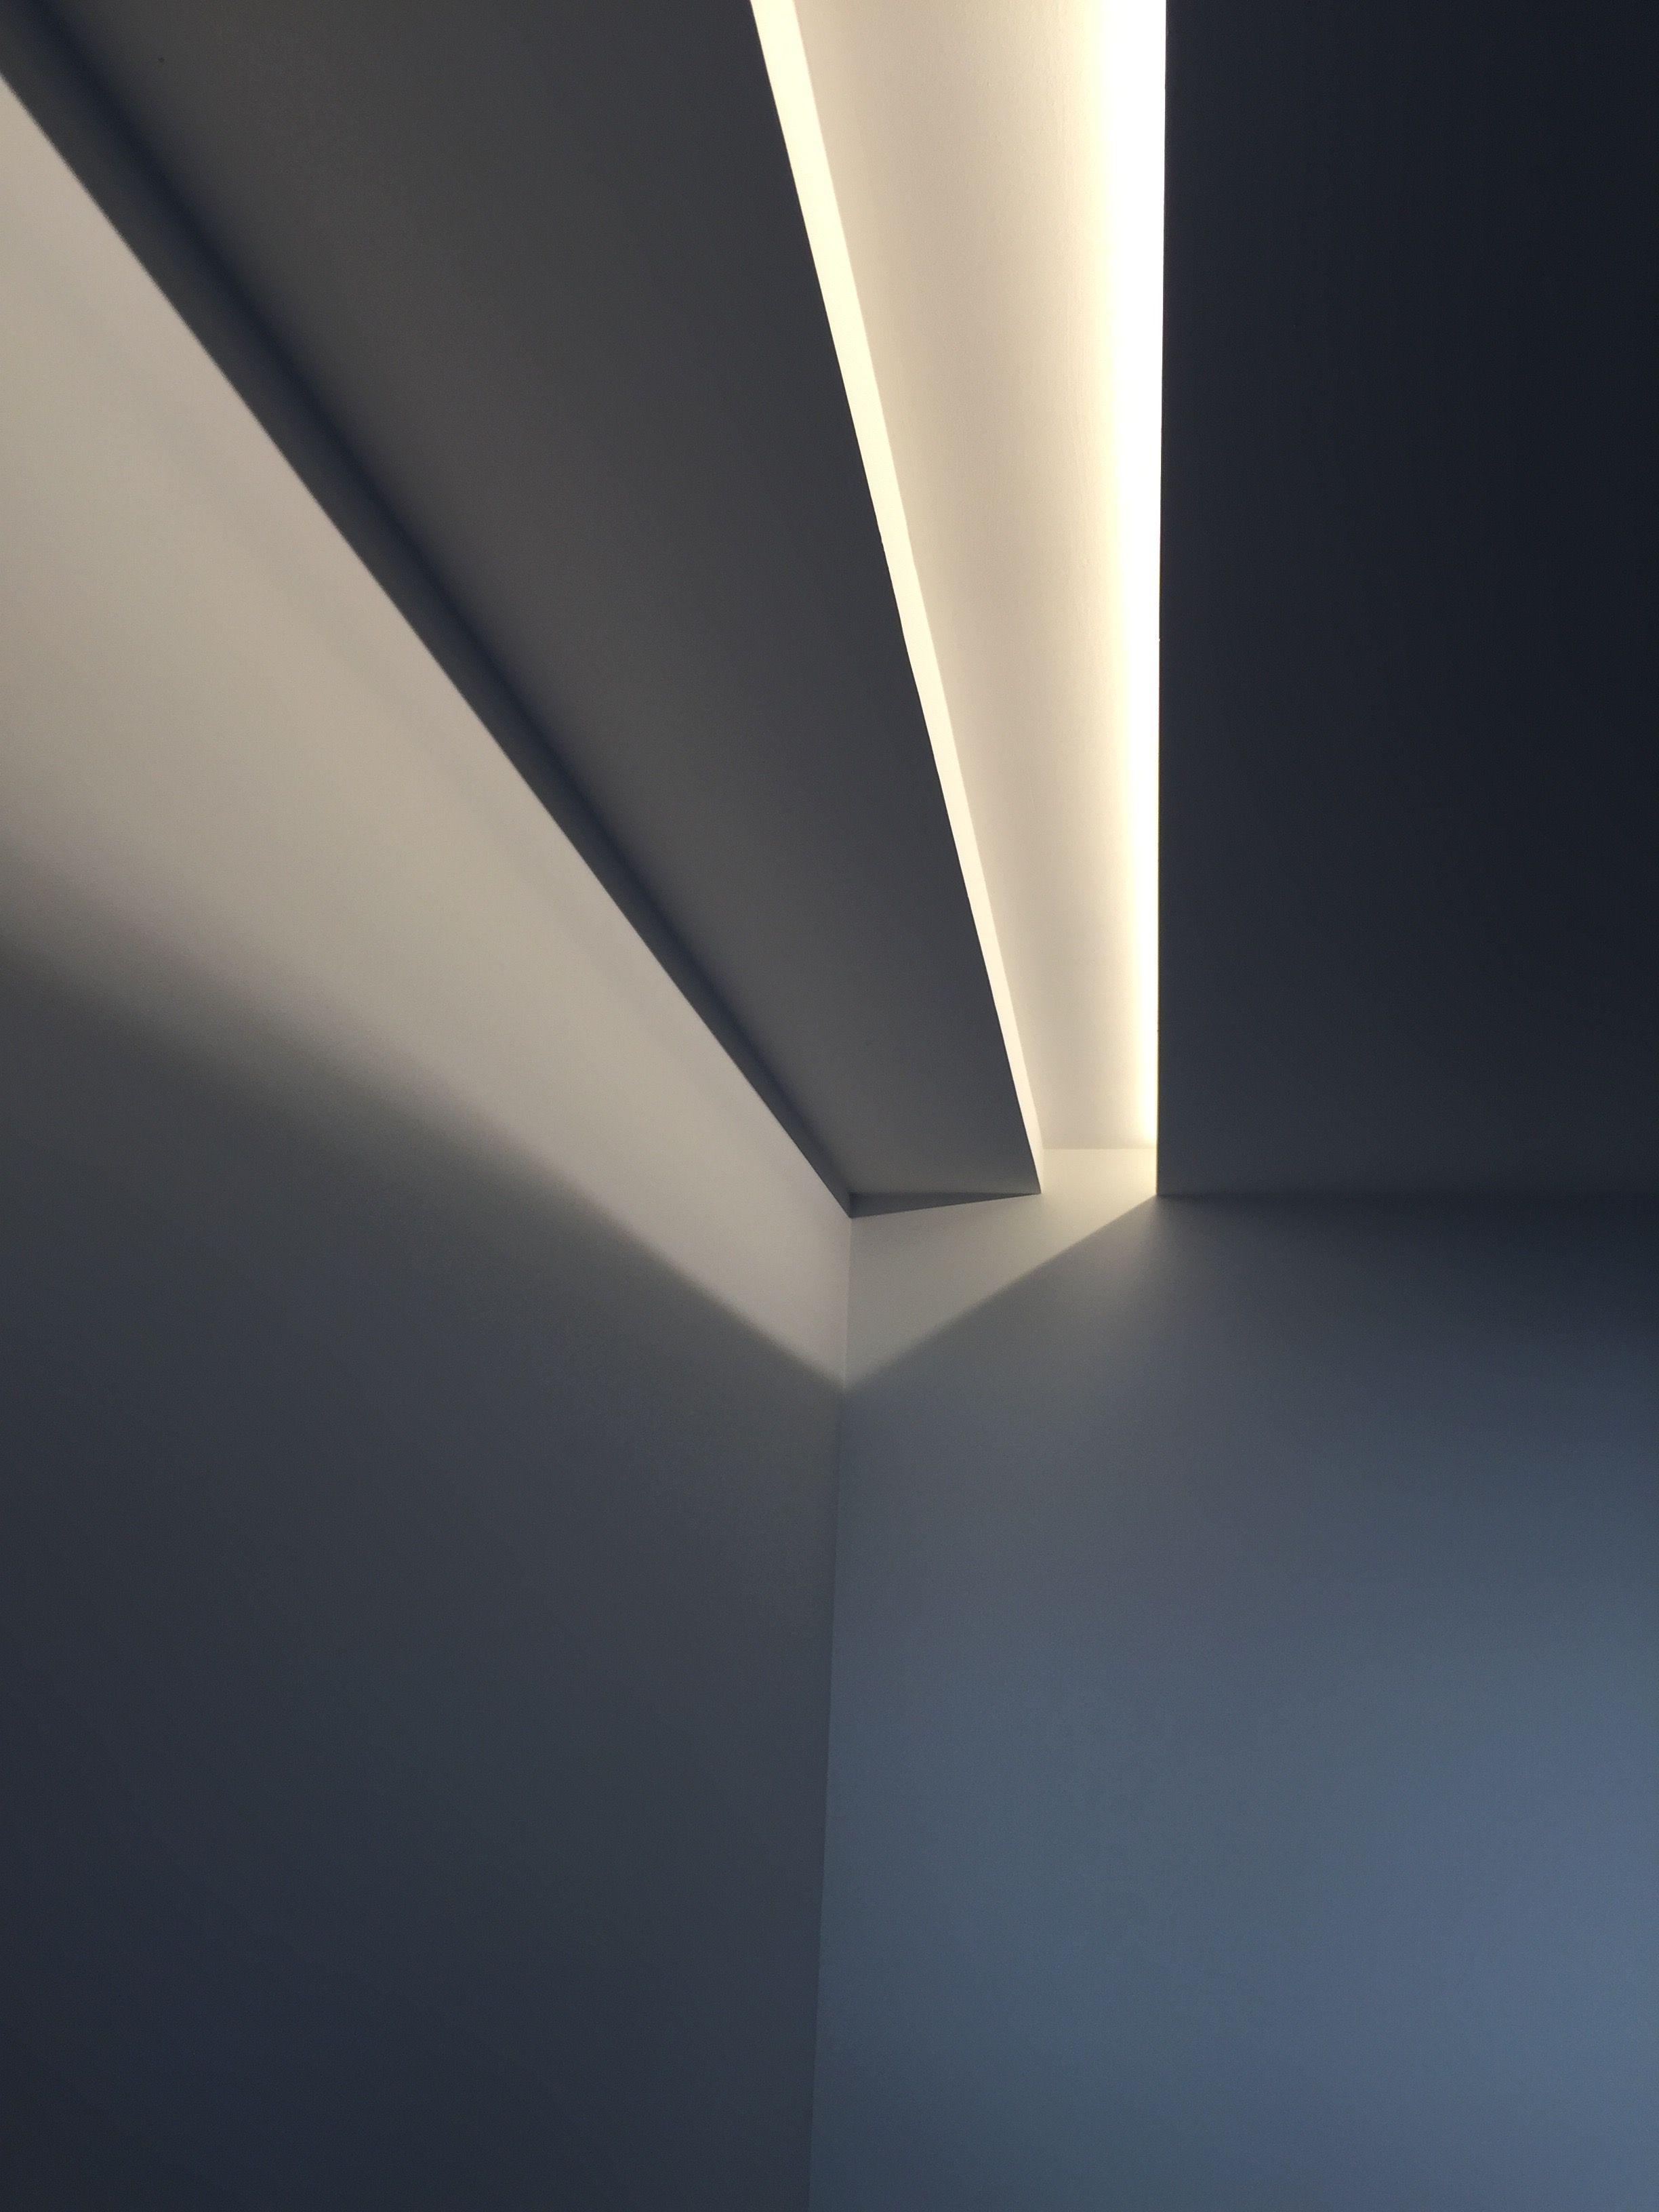 Iluminaci n led mediante luz indirecta con foseado en pladur krea interiorismo pinterest - Iluminacion indirecta led ...